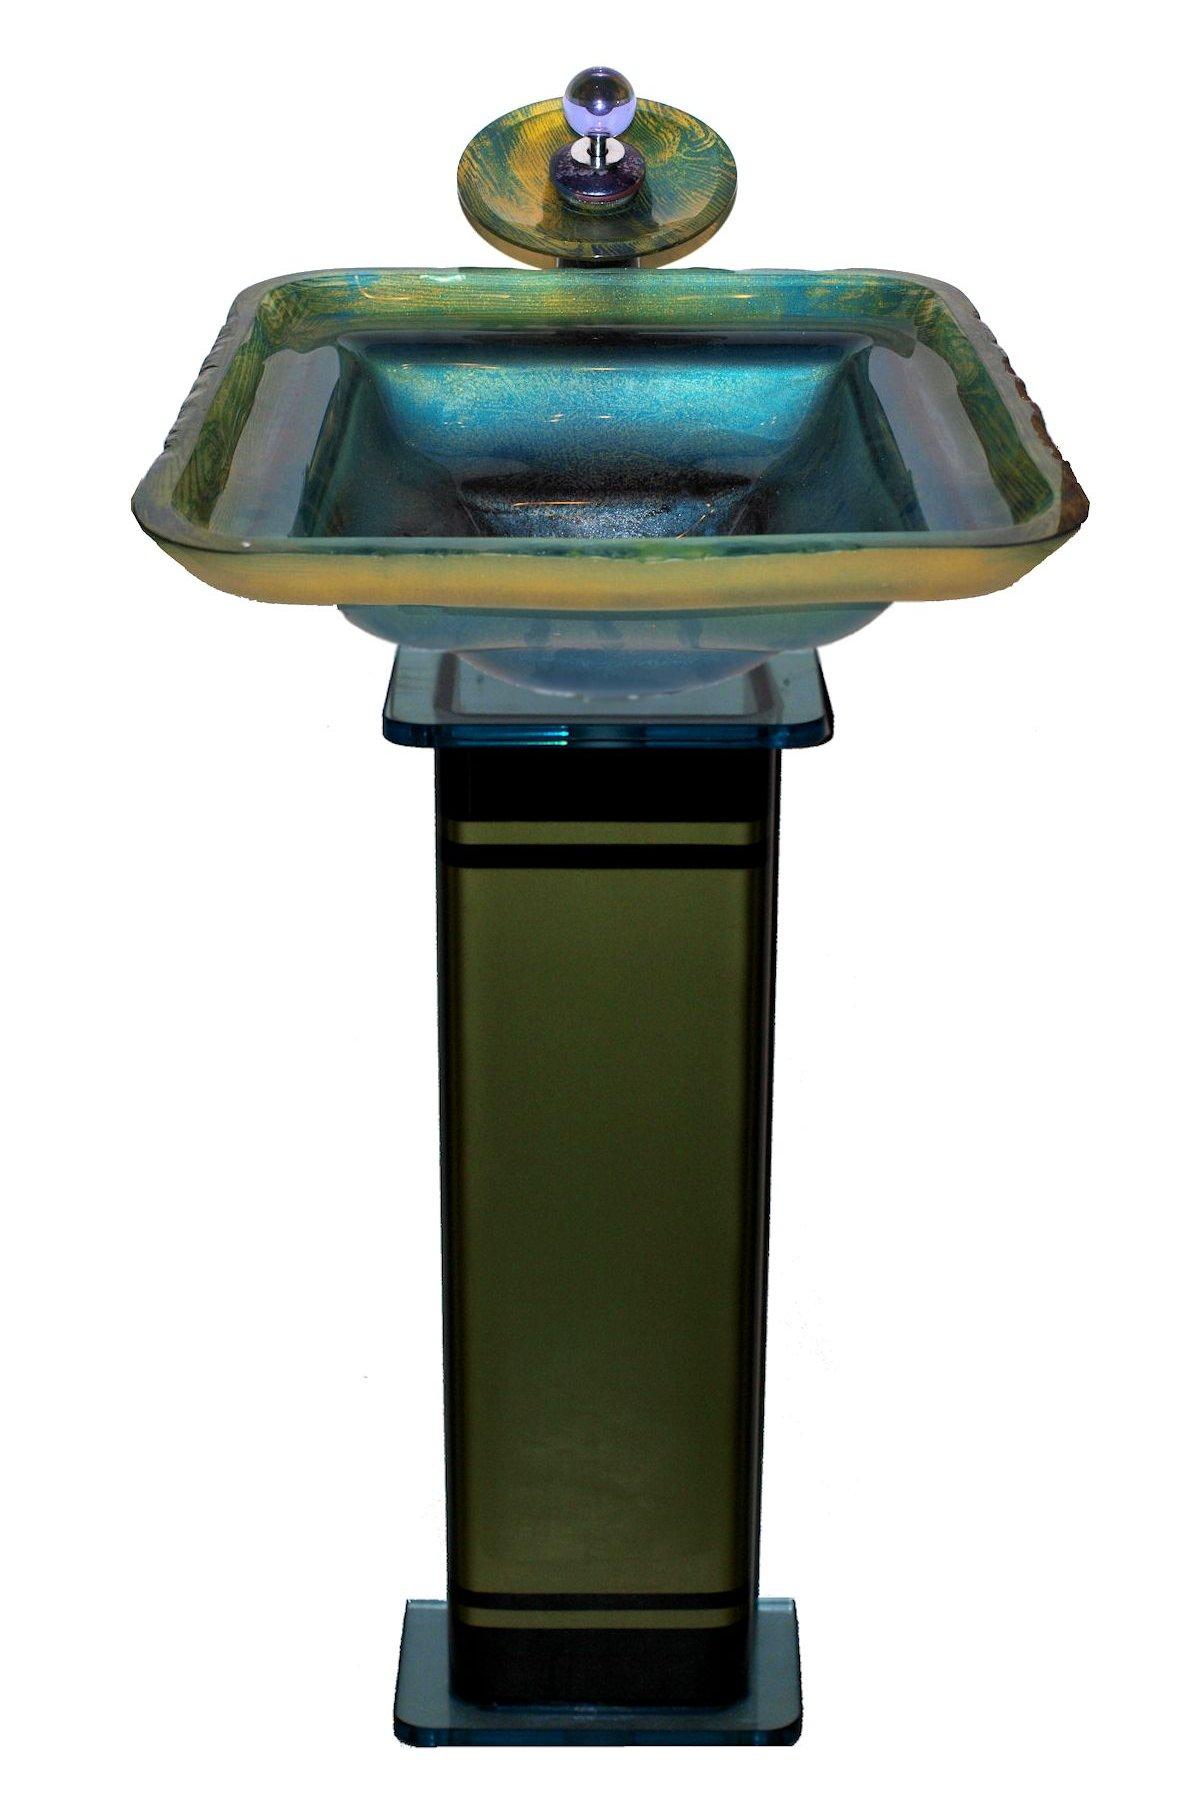 Картинка раковины из стекла 777-wdo-6018